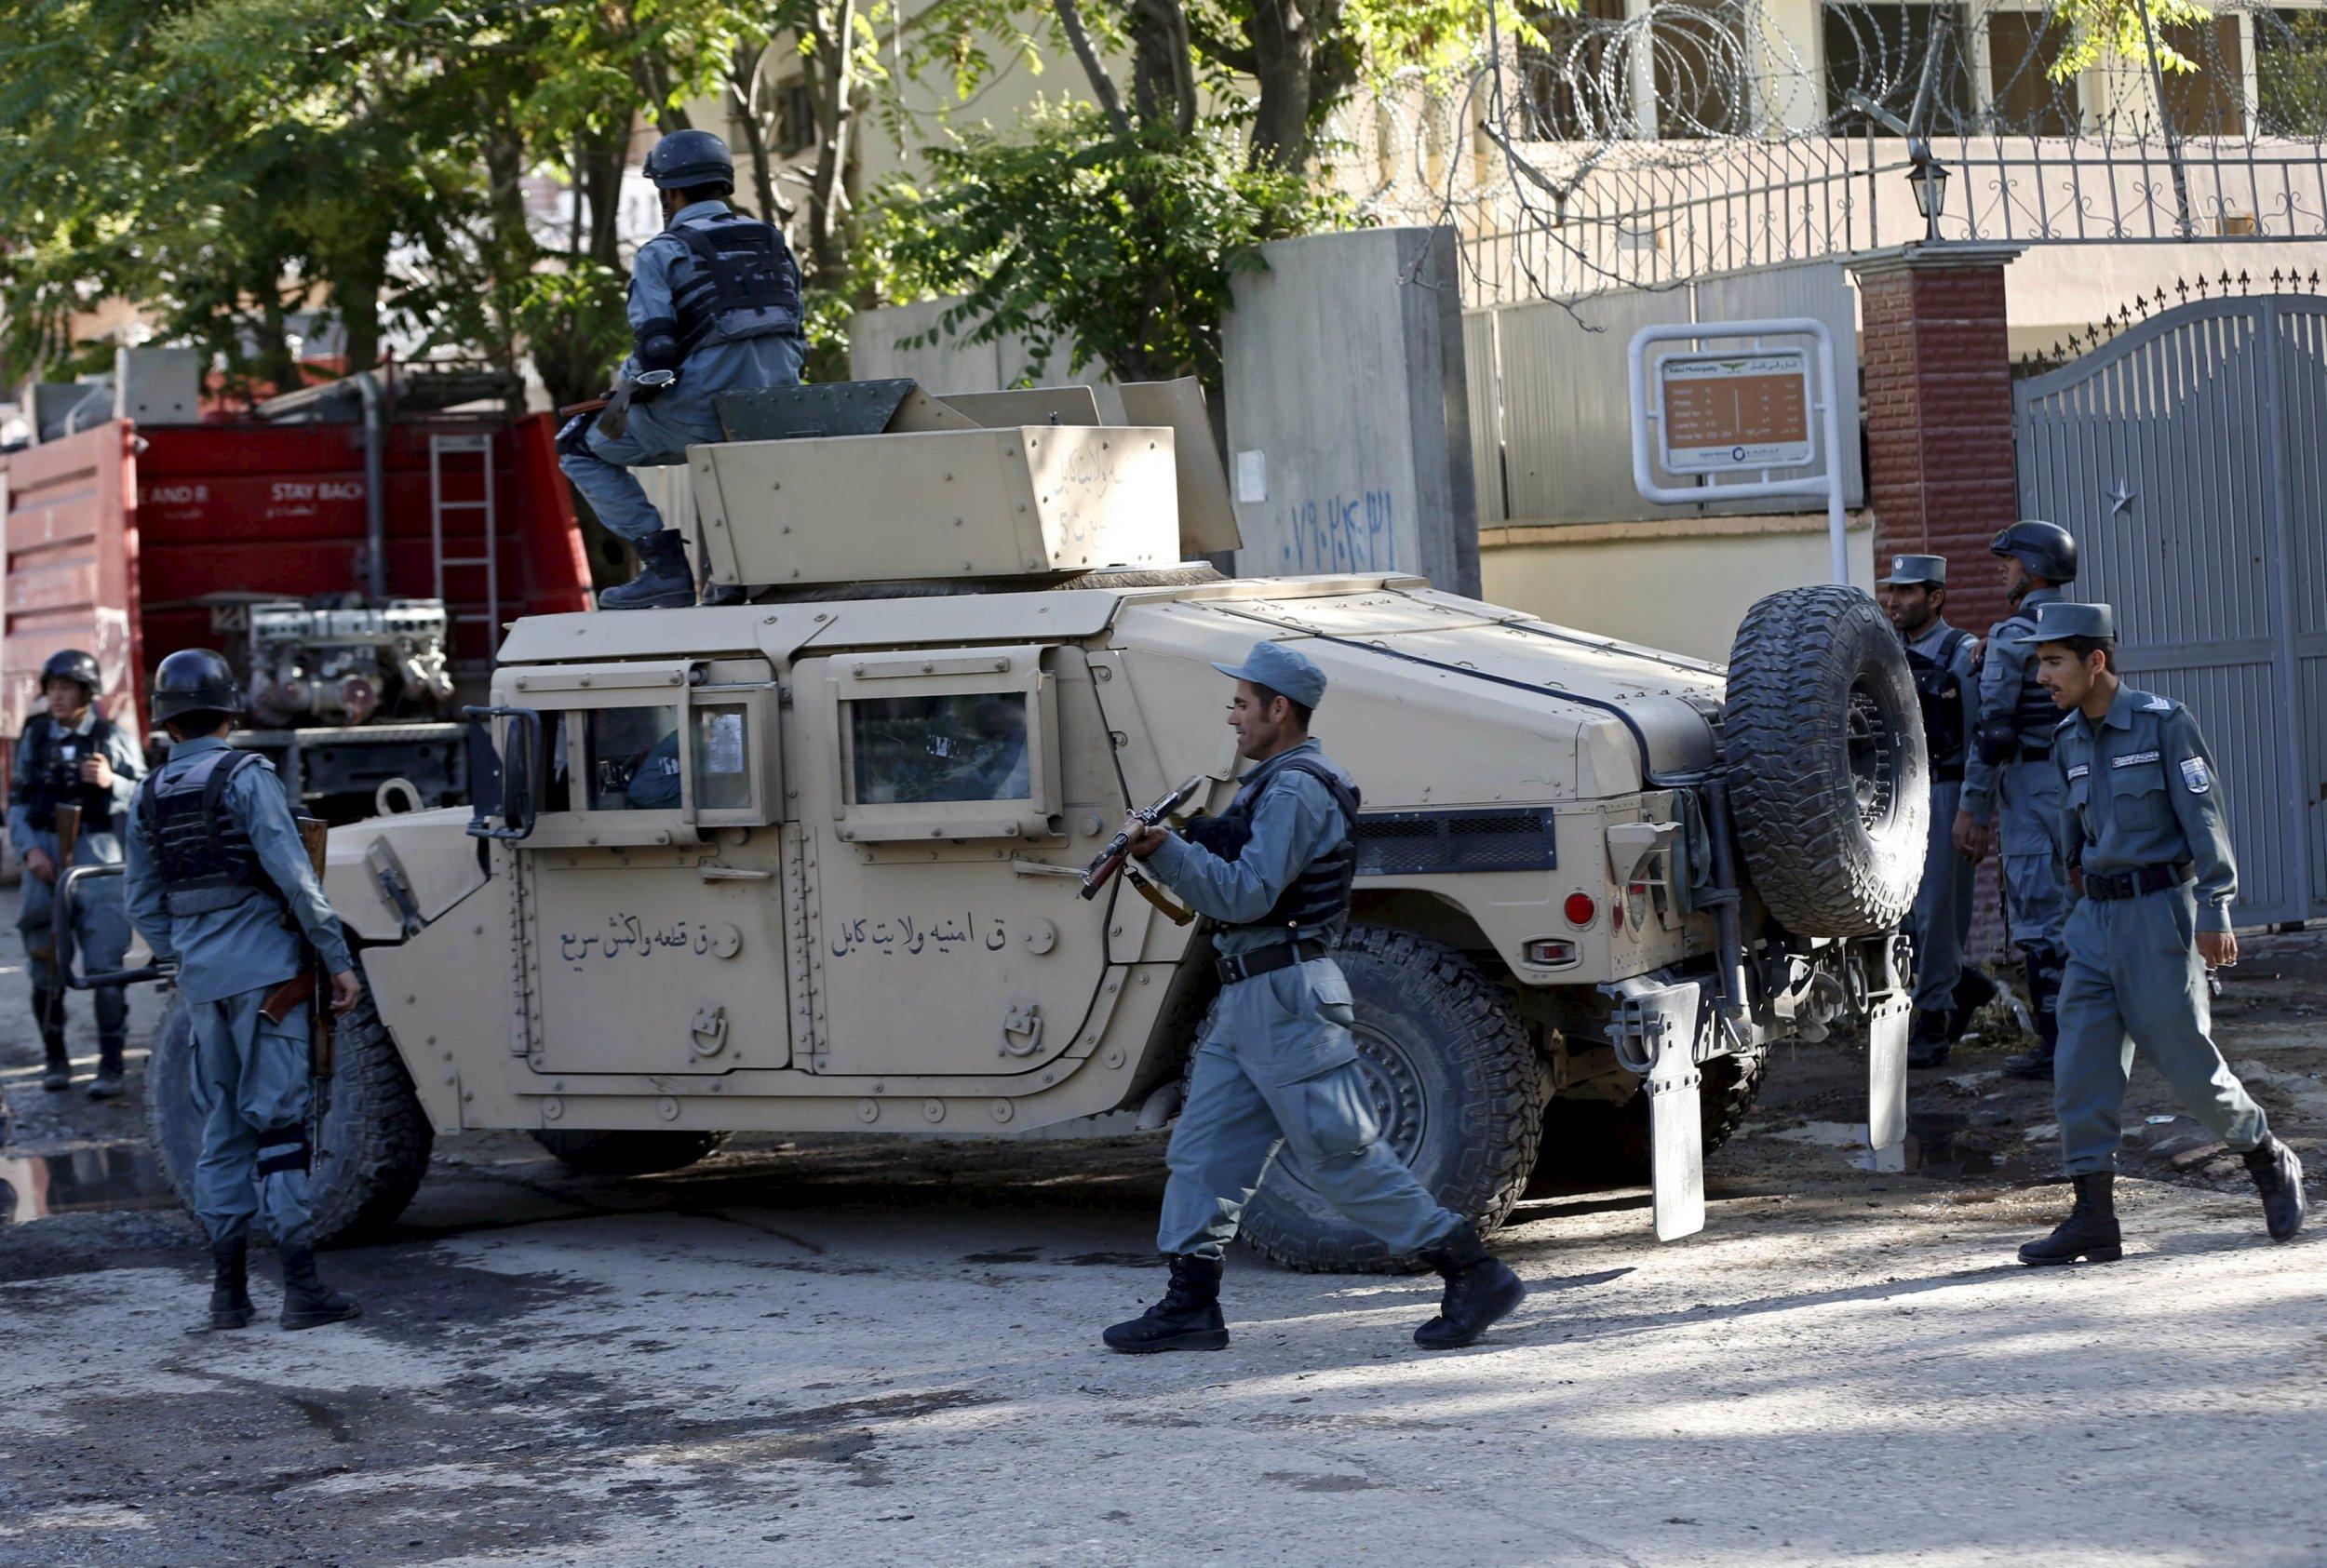 2015-05-27T035546Z_1322518114_GF10000108497_RTRMADP_3_AFGHANISTAN-ATTACK-TALIBAN